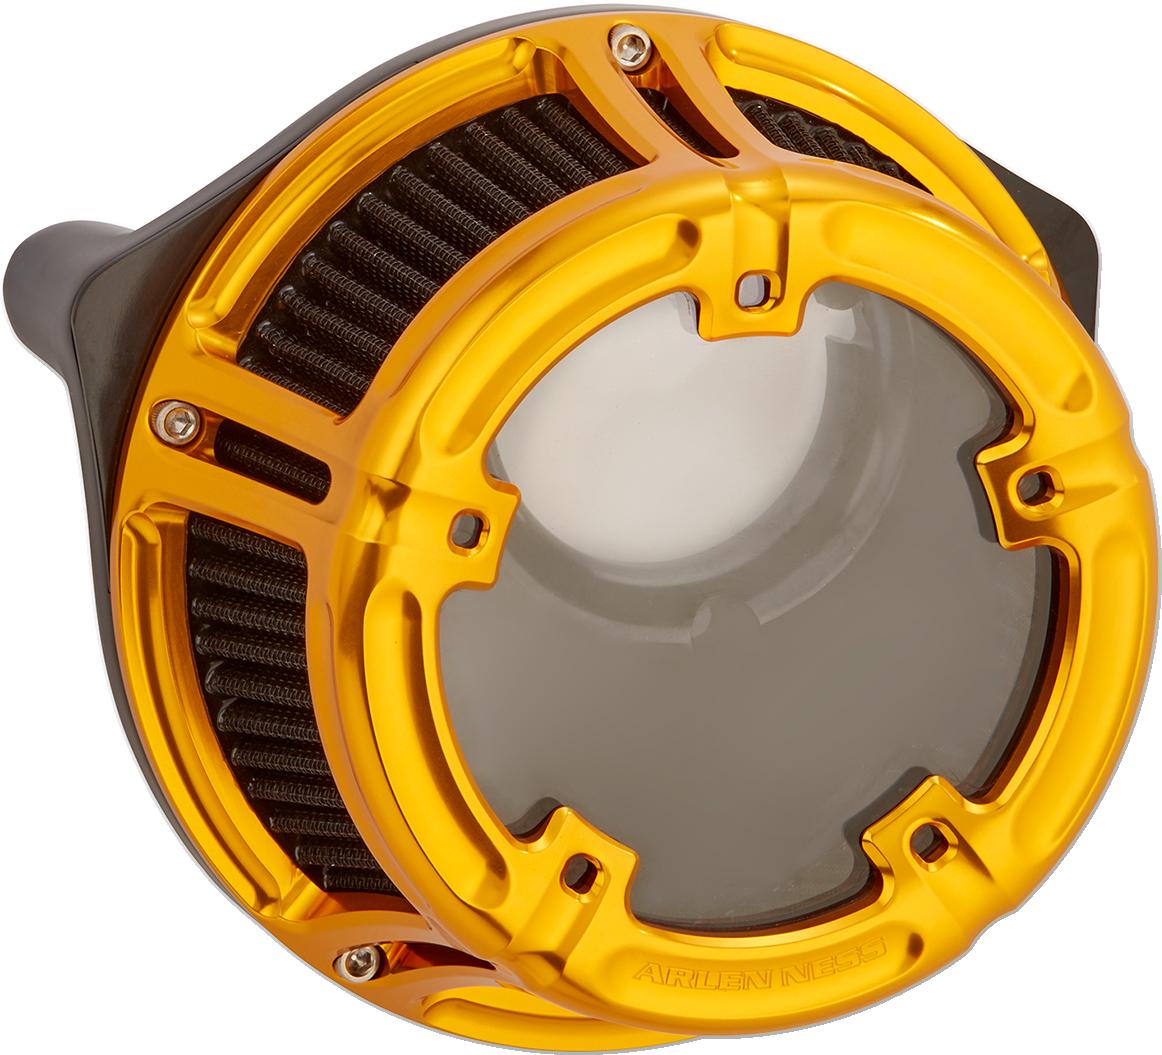 Arlen Ness Gold Method Air Cleaner Filter 91-18 Harley Sportster XLC XLR XLH XR